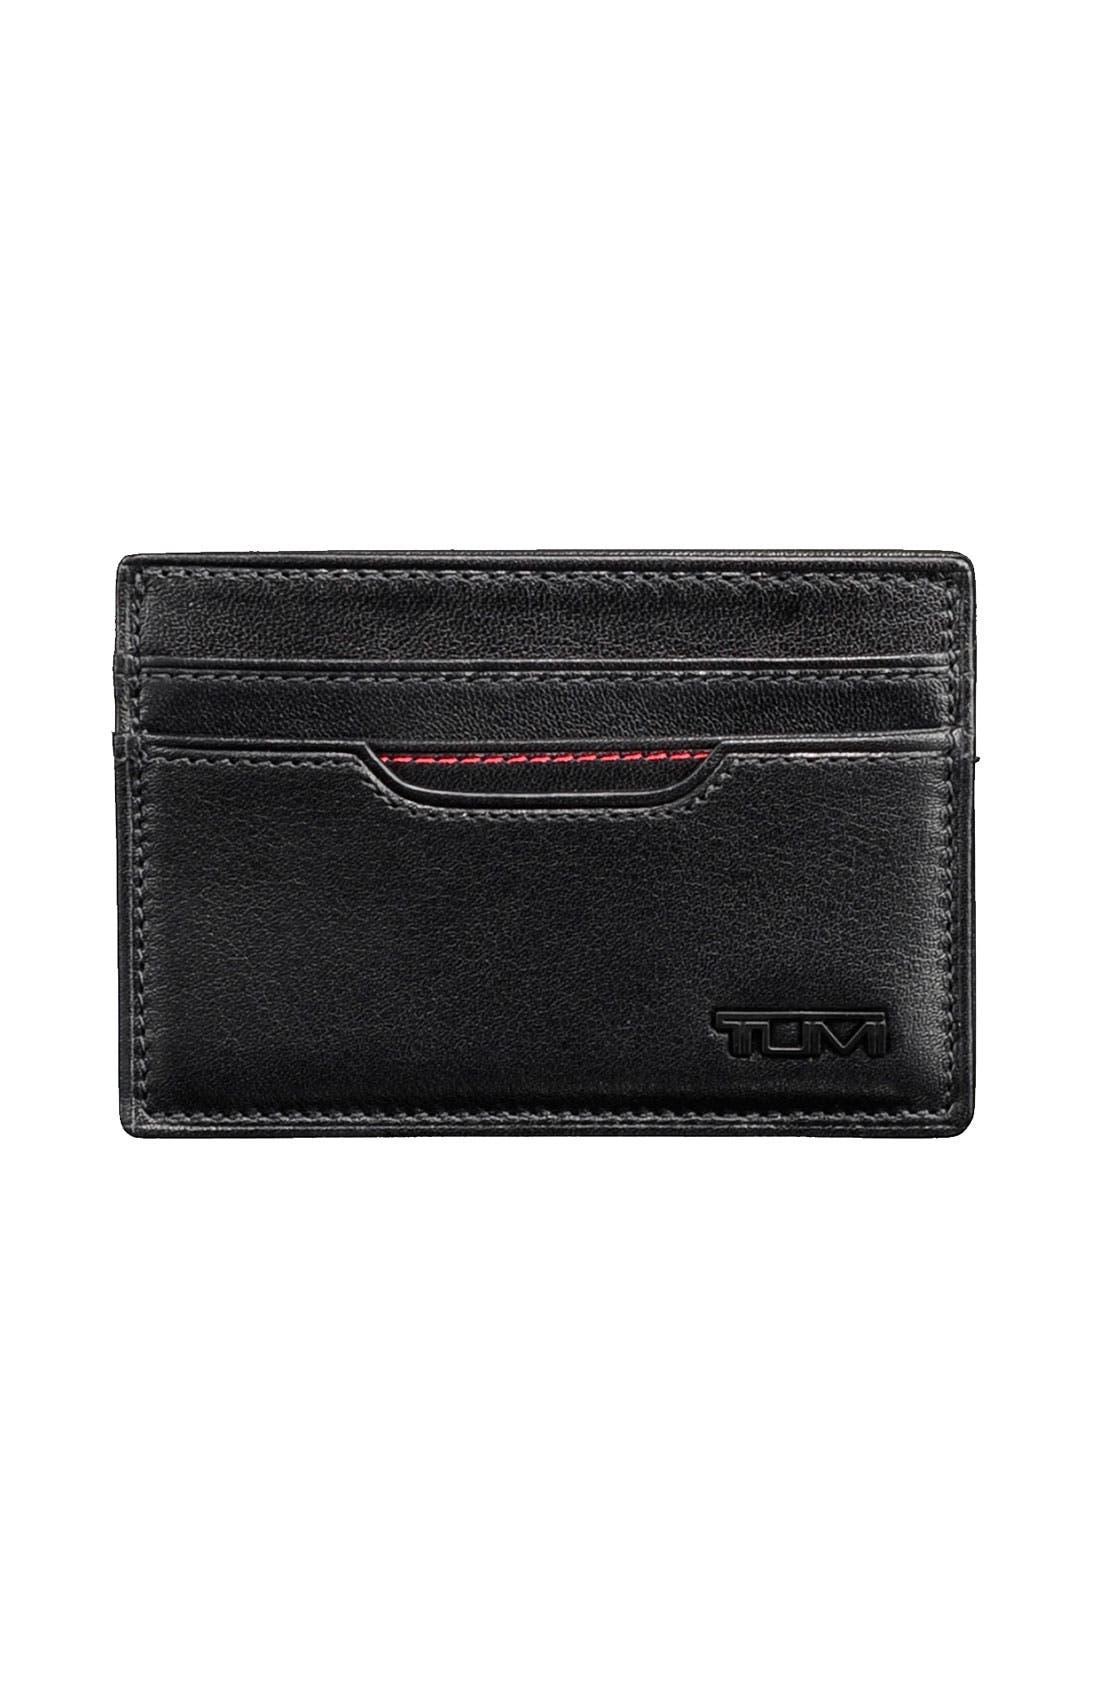 Alternate Image 1 Selected - Tumi 'Delta' Slim Card Case ID Wallet